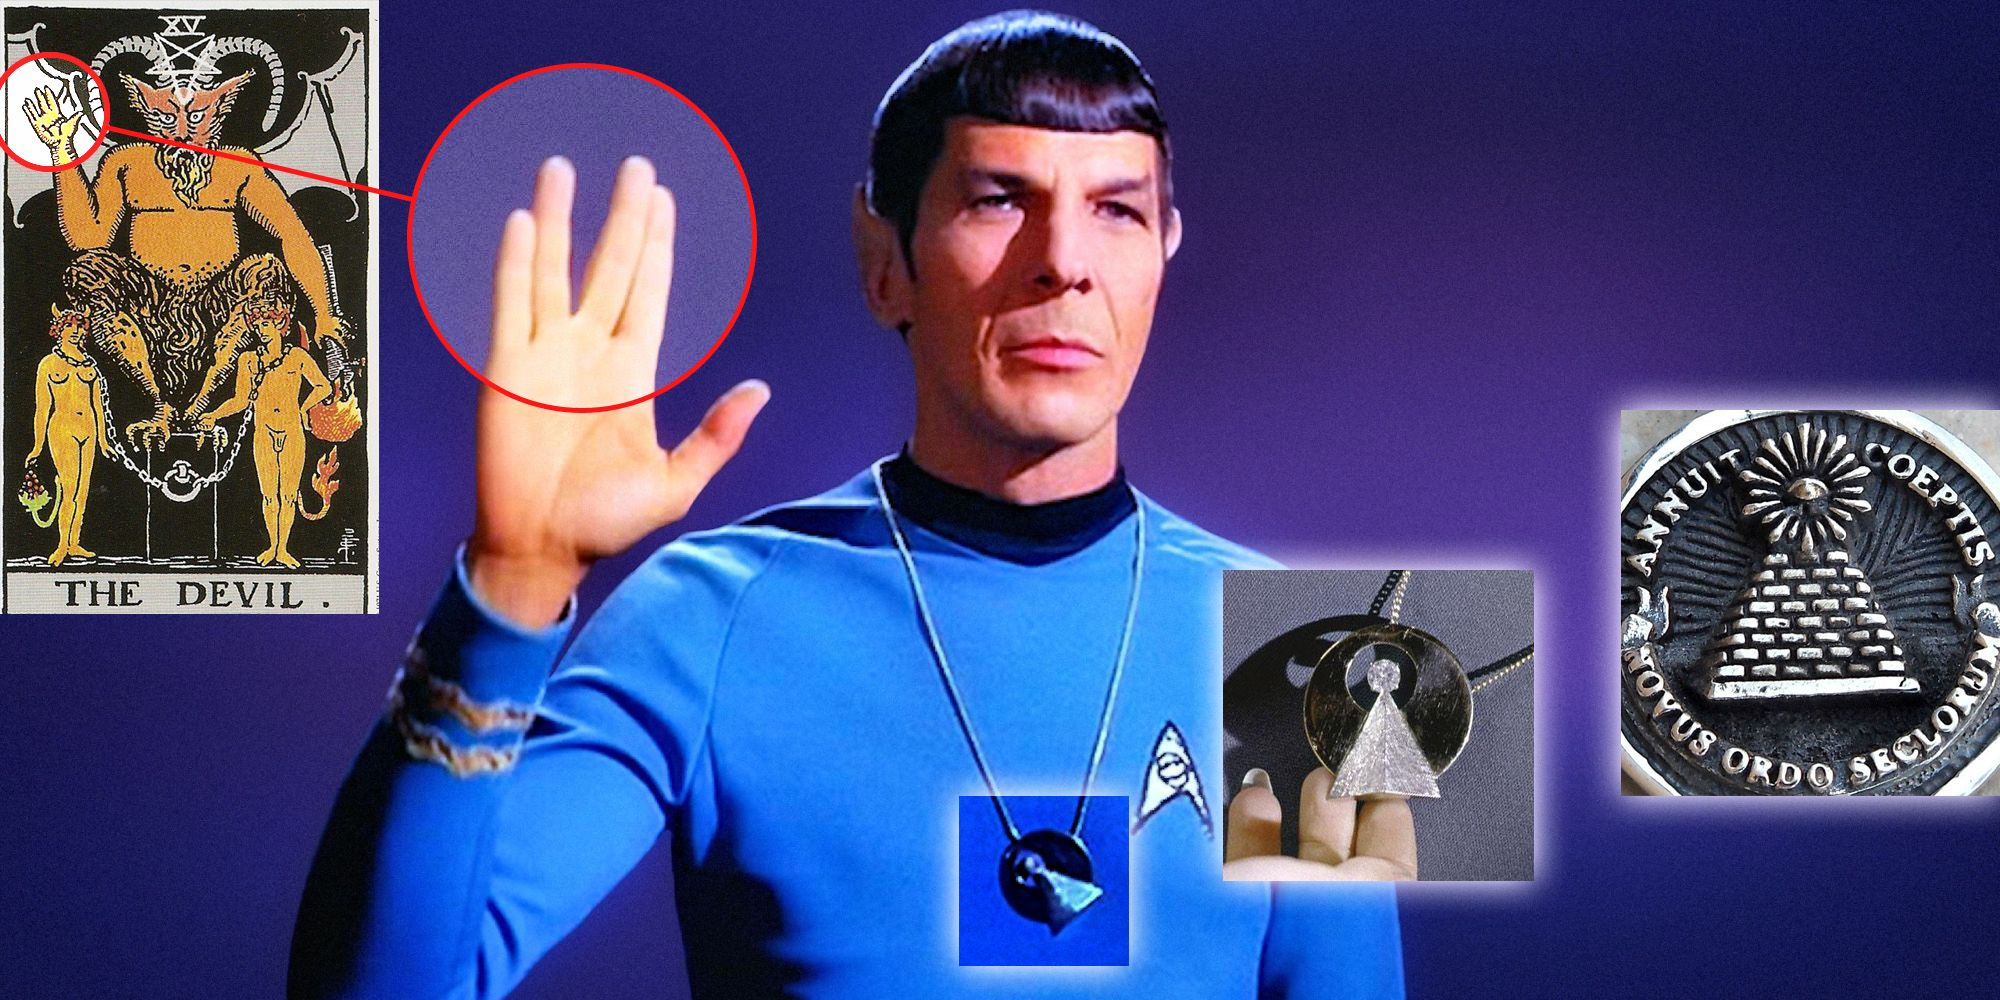 Mr spock star trek hidden illuminati symbolism illuminati mr spock star trek hidden illuminati symbolism biocorpaavc Choice Image